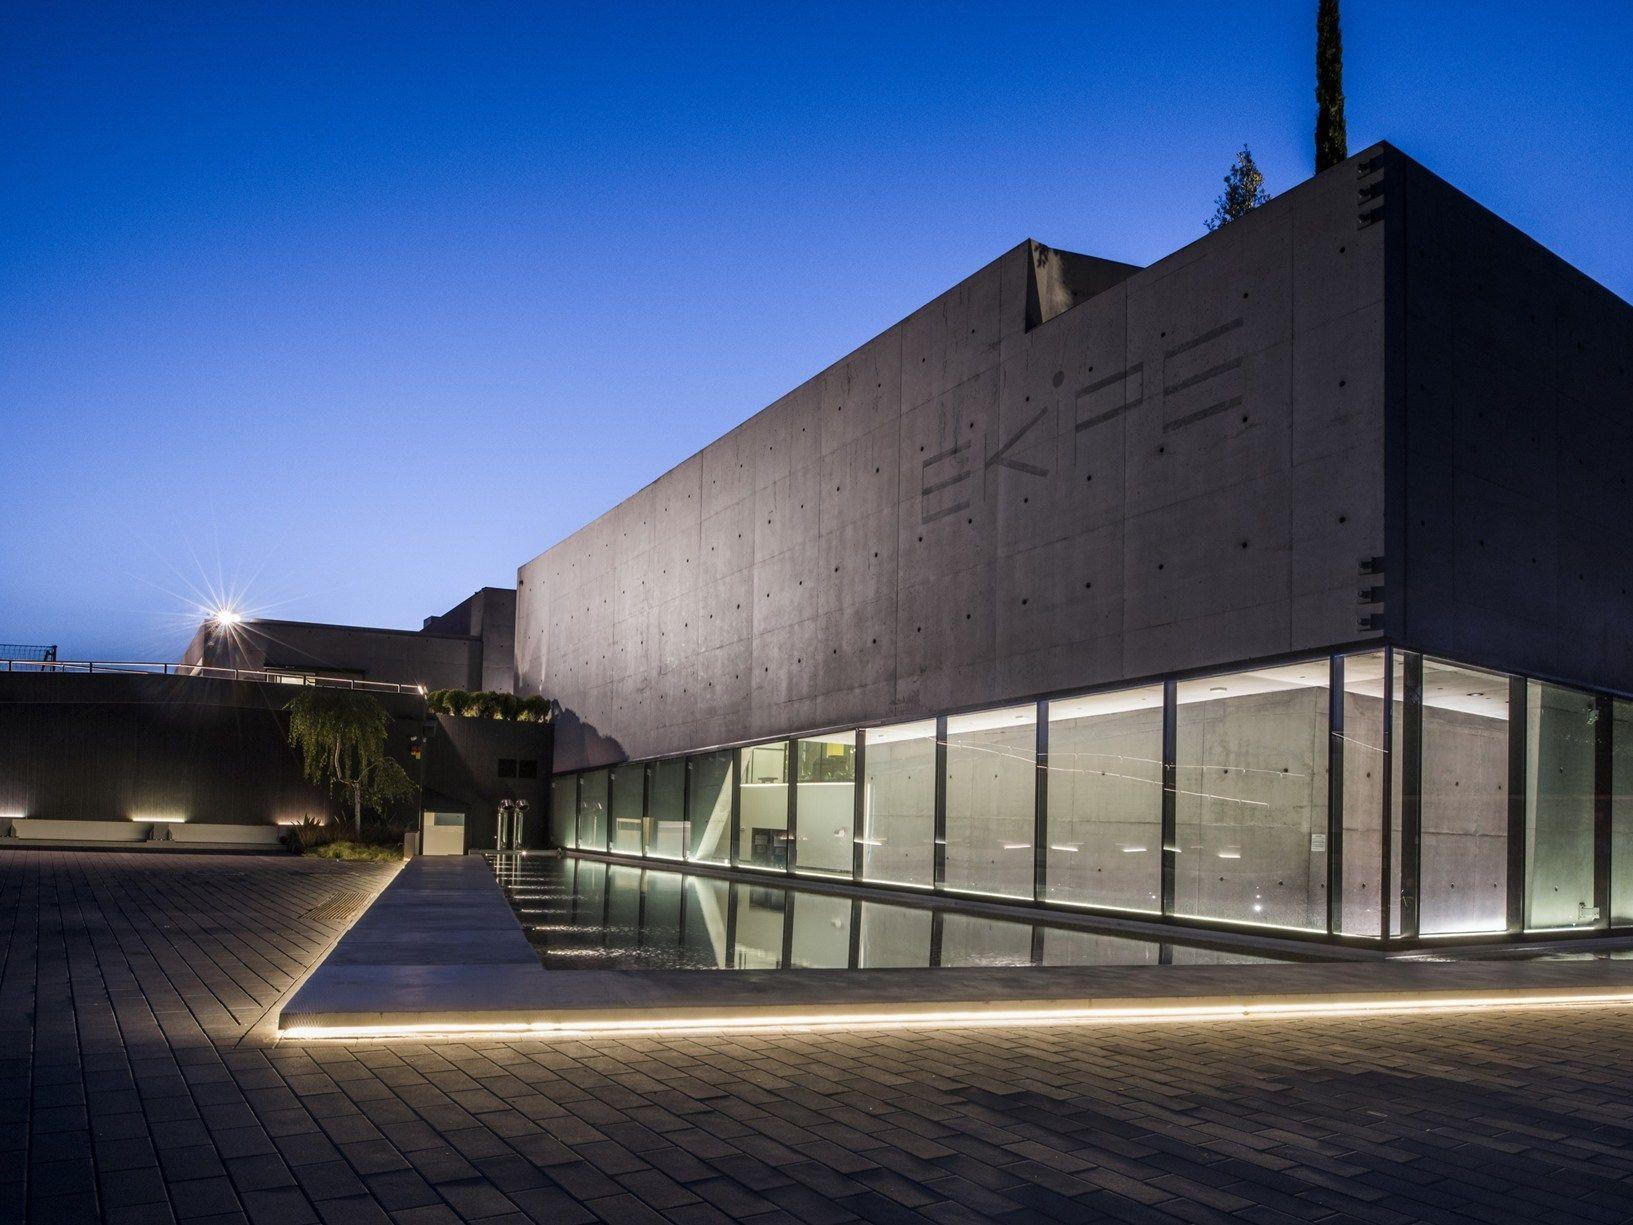 architettura brutalista interni glamour